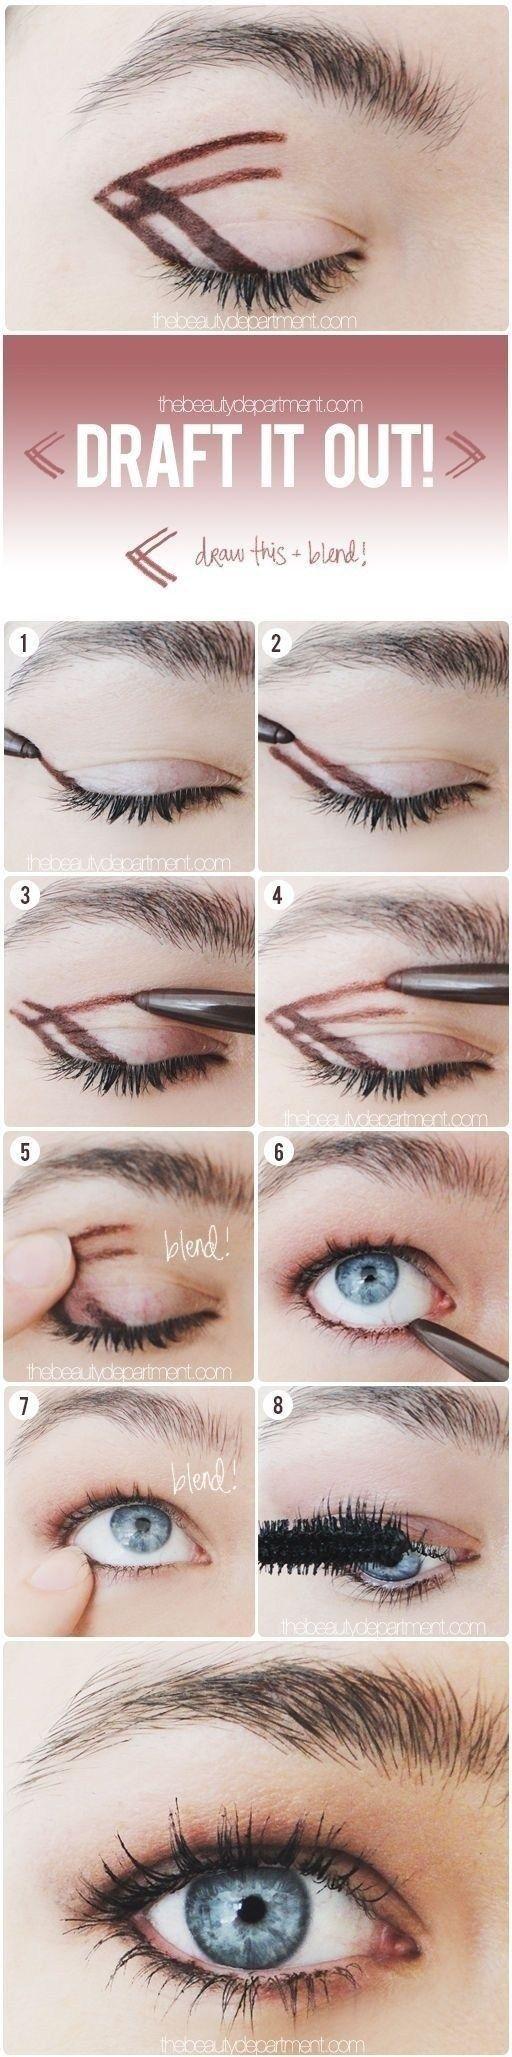 8 Amazing Eye Makeup Hacks That Are Borderline Genius - Chasing Wish